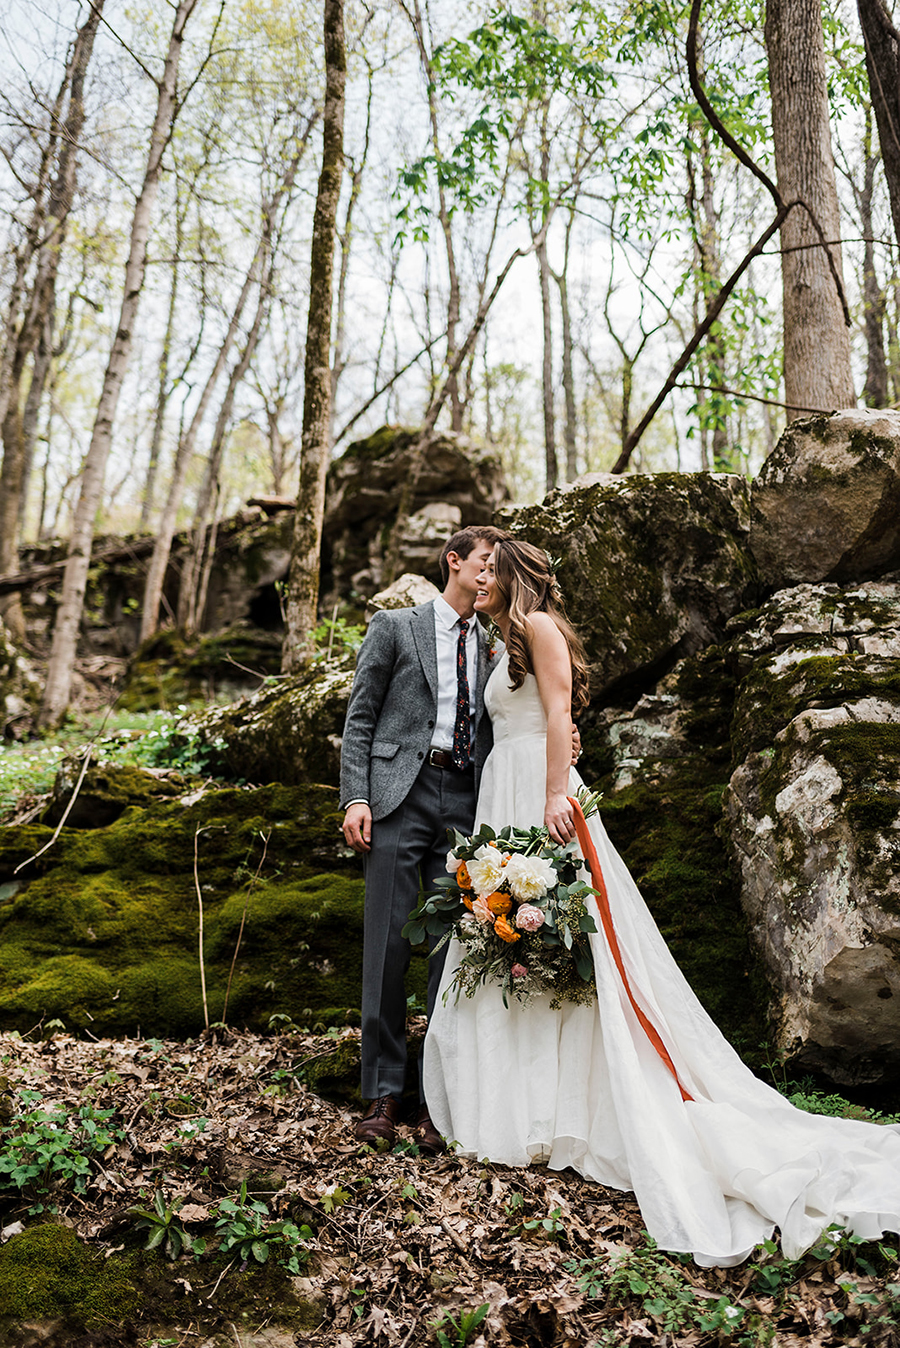 wedding in the woods.jpg